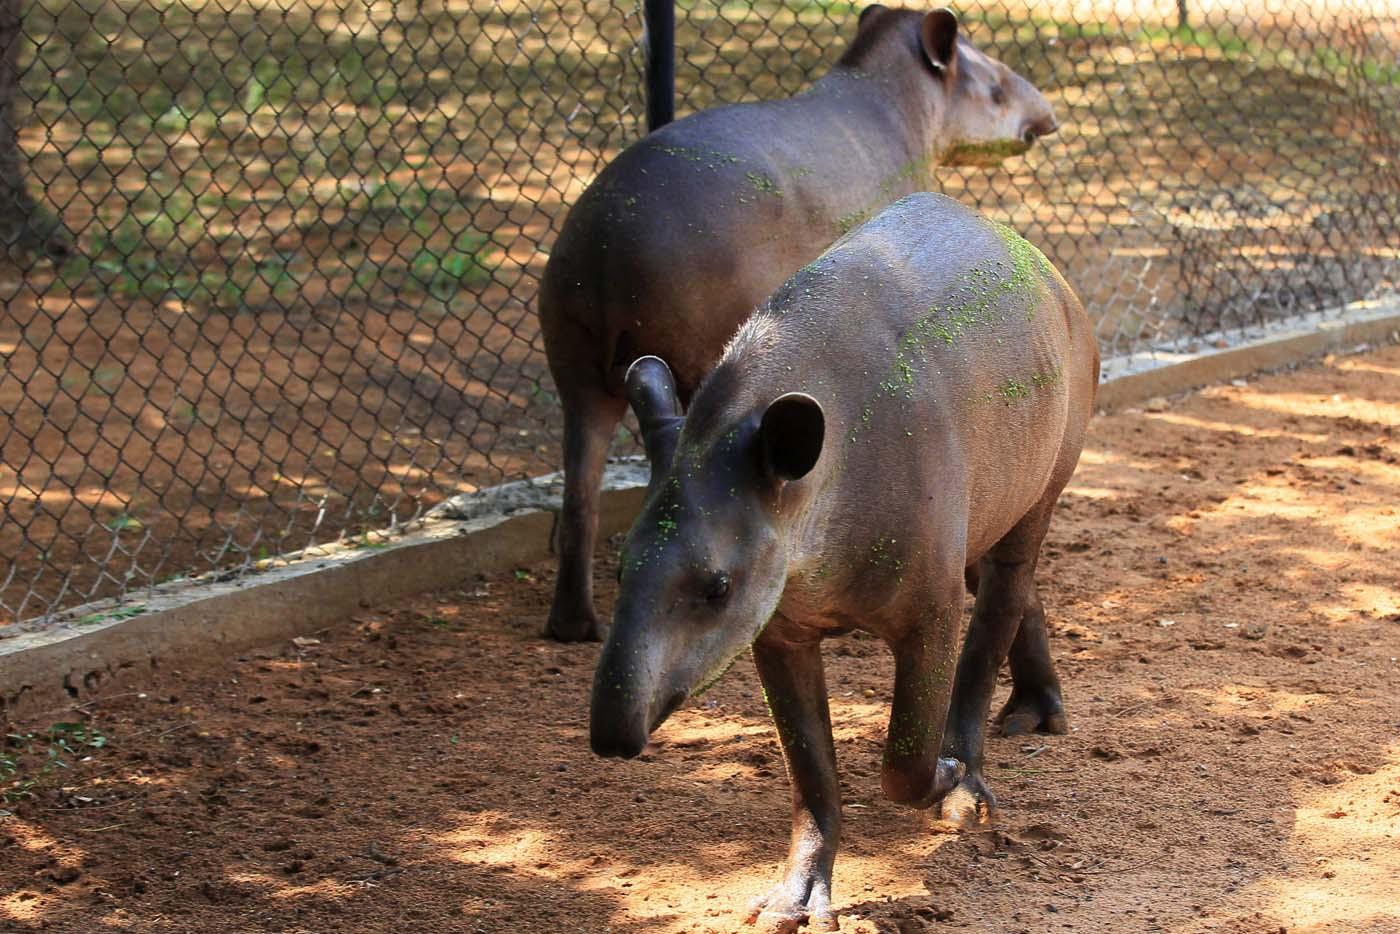 Tapirs are seen at the Zulia's Metropolitan Zoological Park in Maracaibo, Venezuela August 16, 2017. REUTERS/Isaac Urrutia